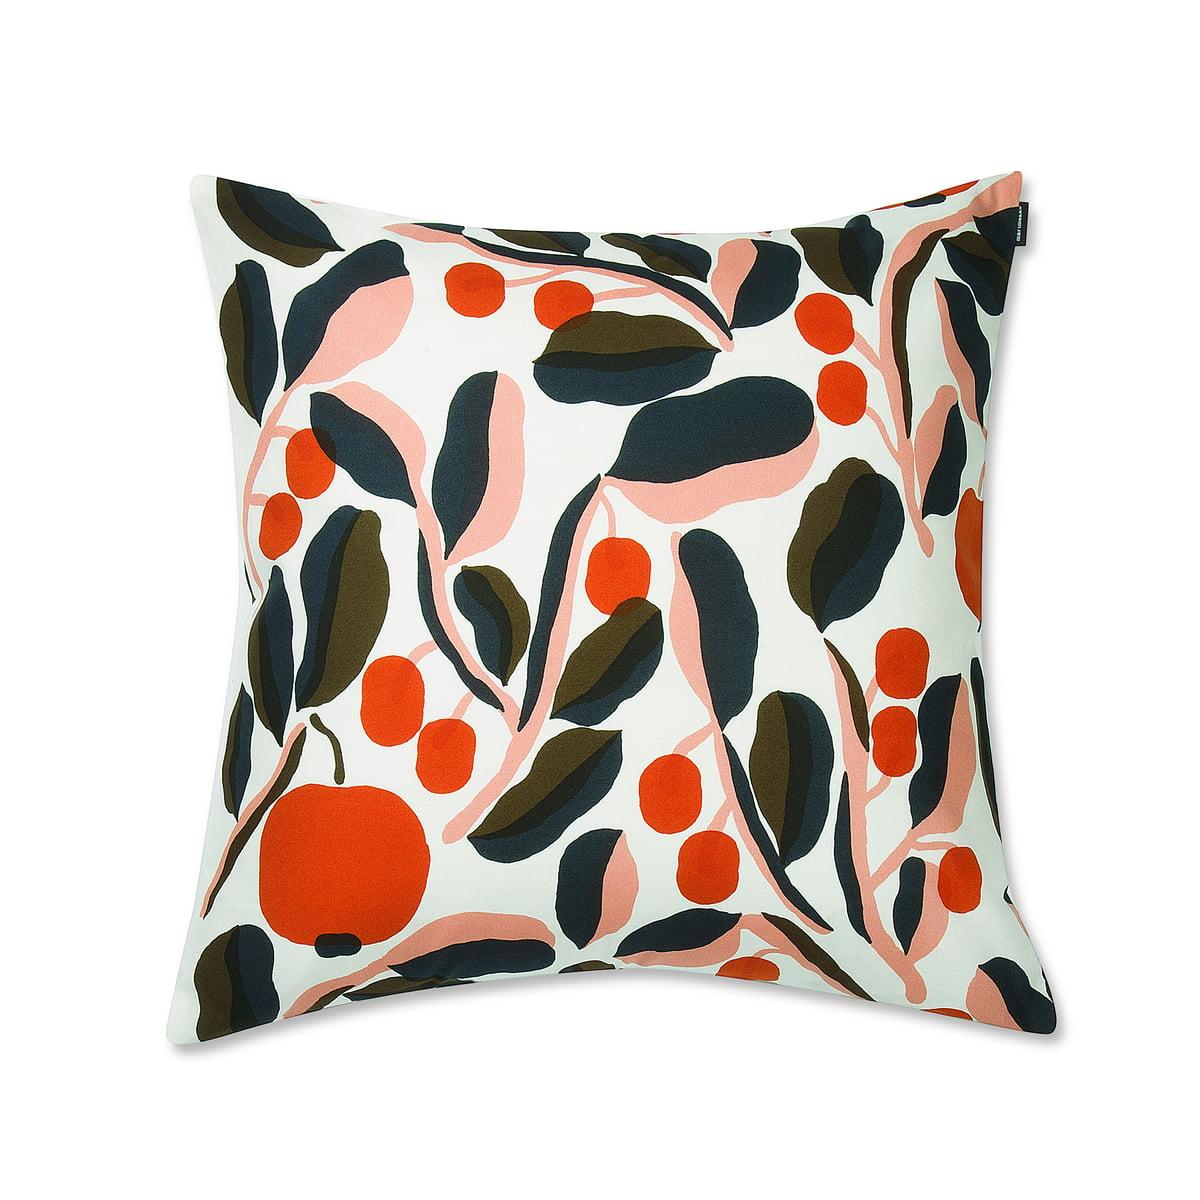 Jaspi Apple Cushion Cover By Marimekko Connox